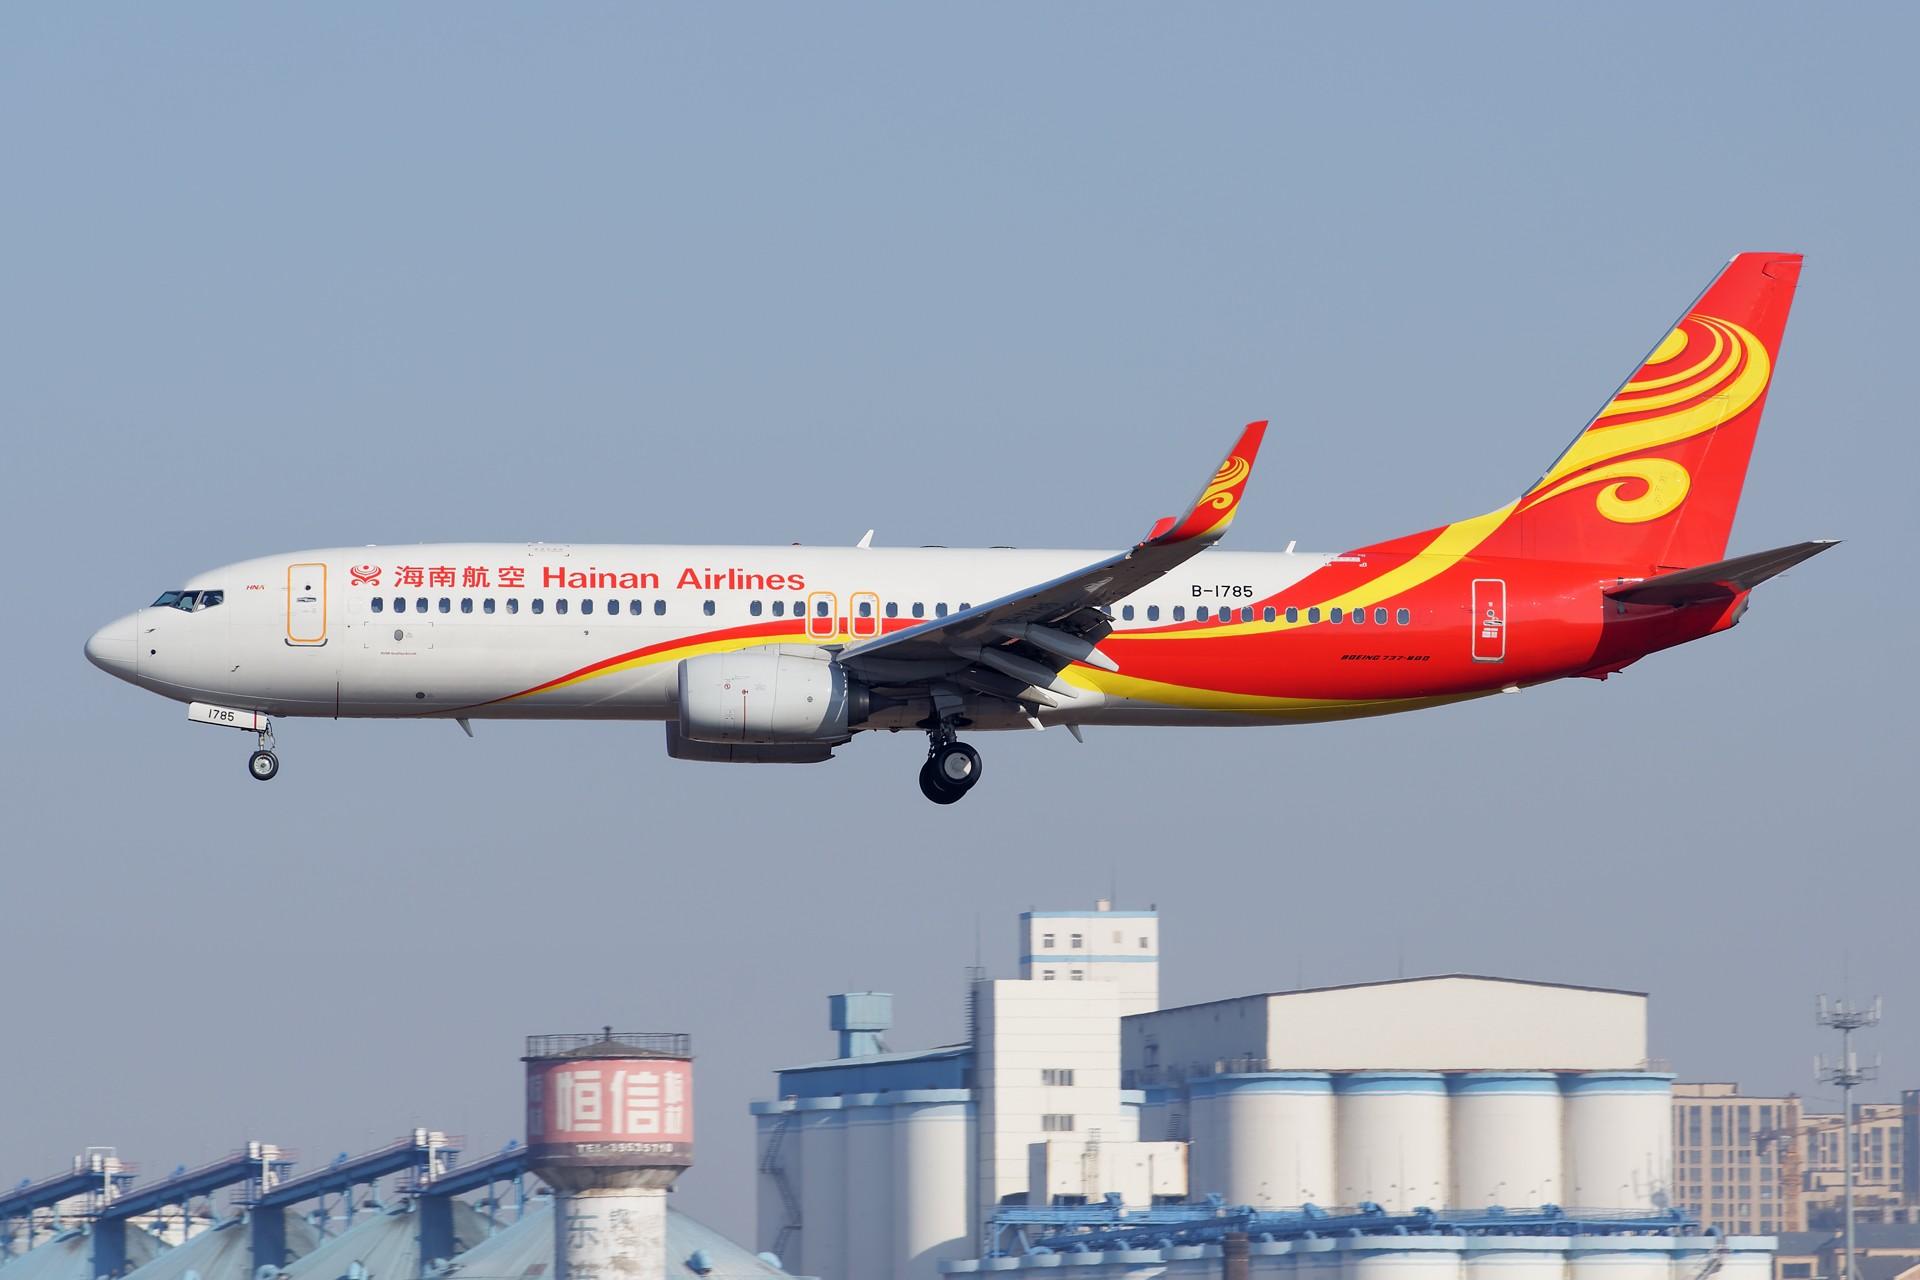 Re:[原创]★[DLC]一点有趣的事情(持续更新中)★ BOEING 737-800 B-1785 中国大连国际机场